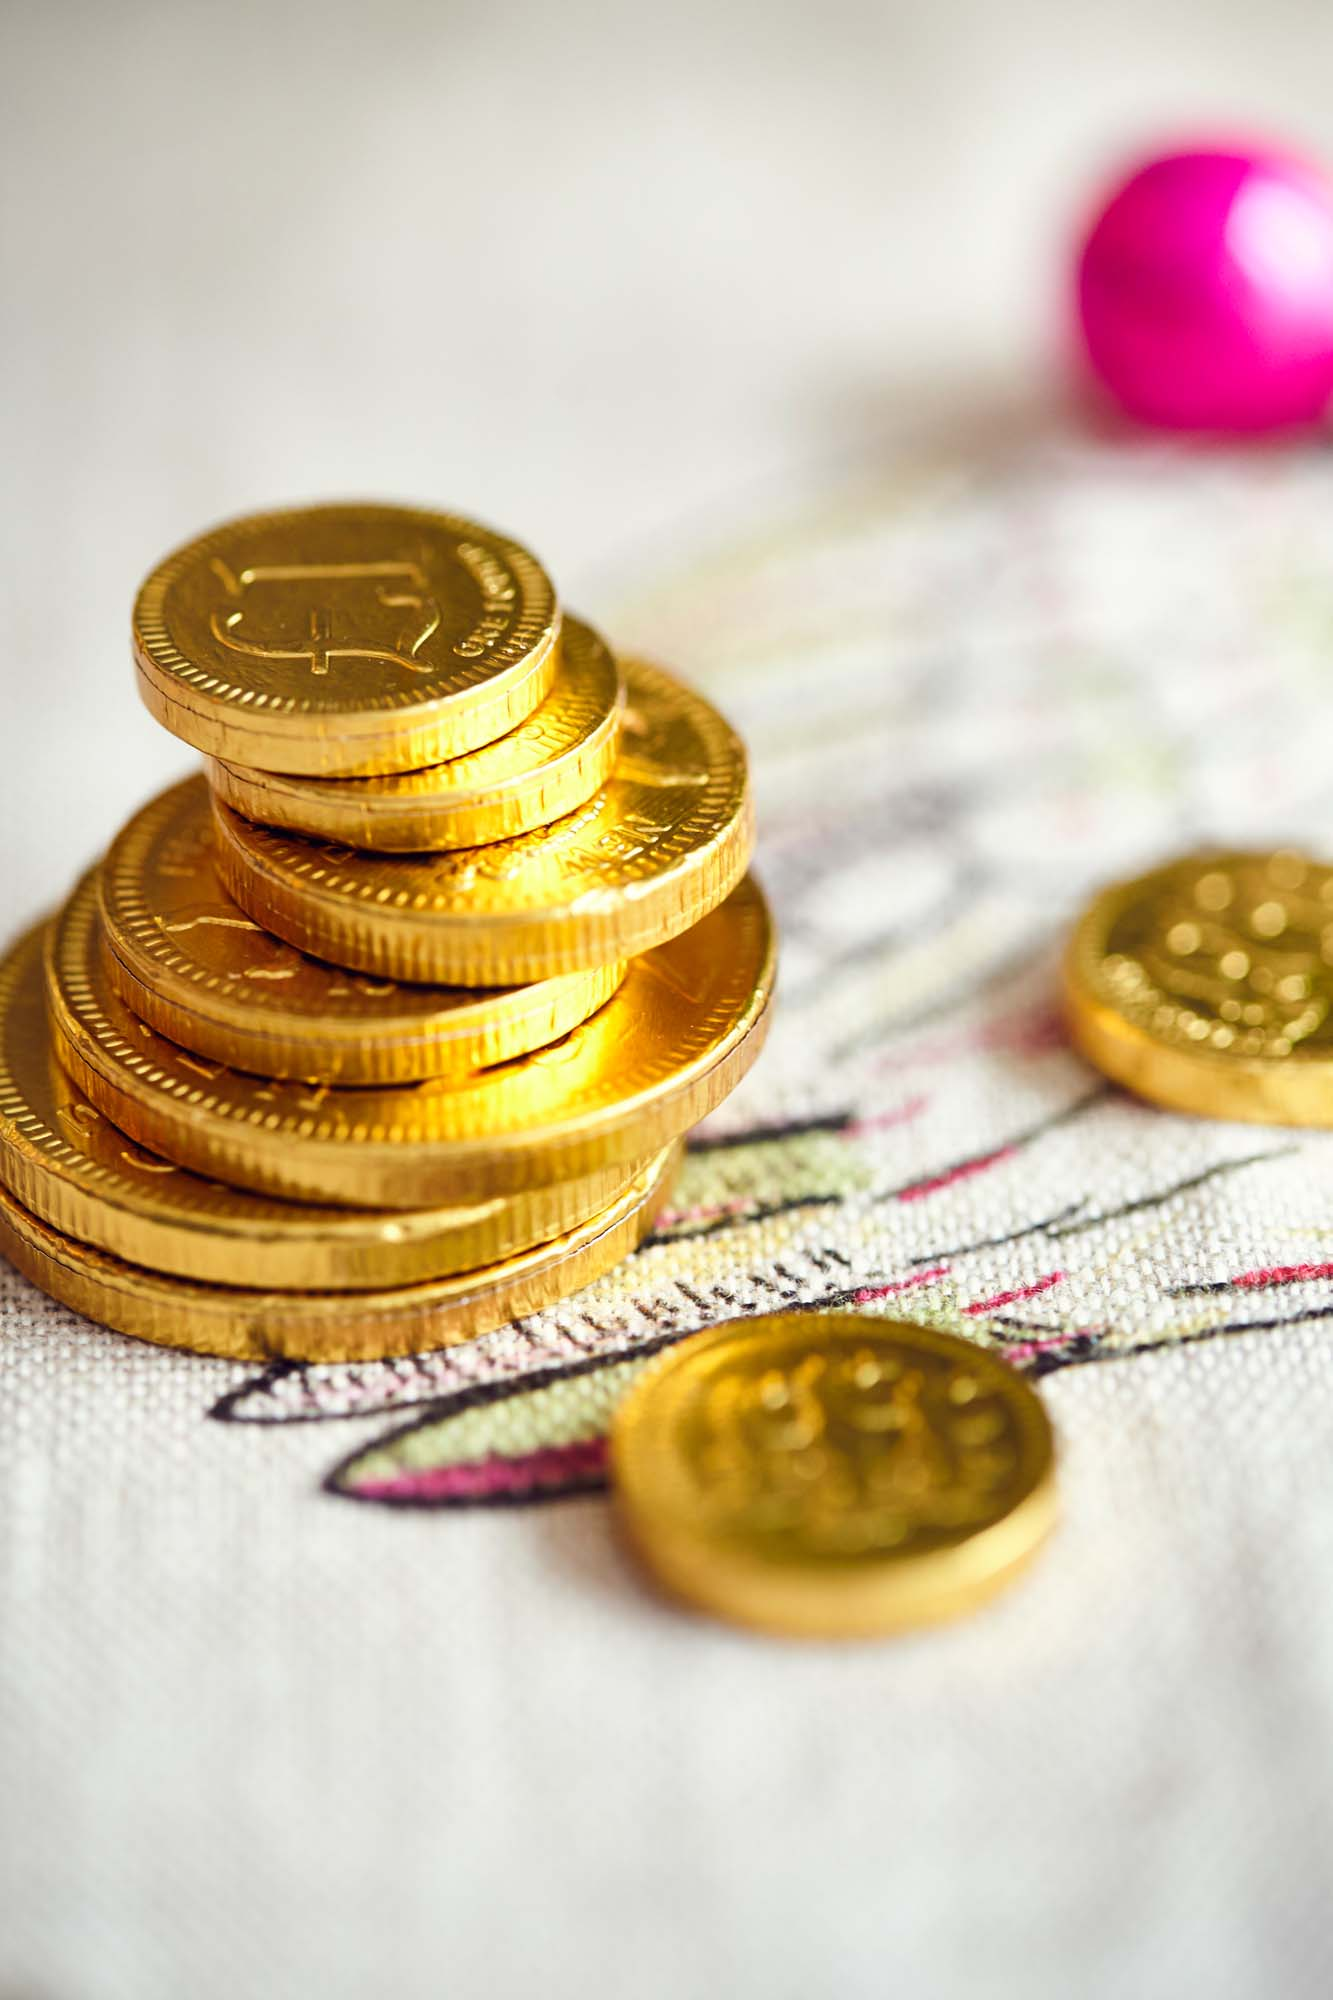 Chocolate coins as a Christmas table decoration